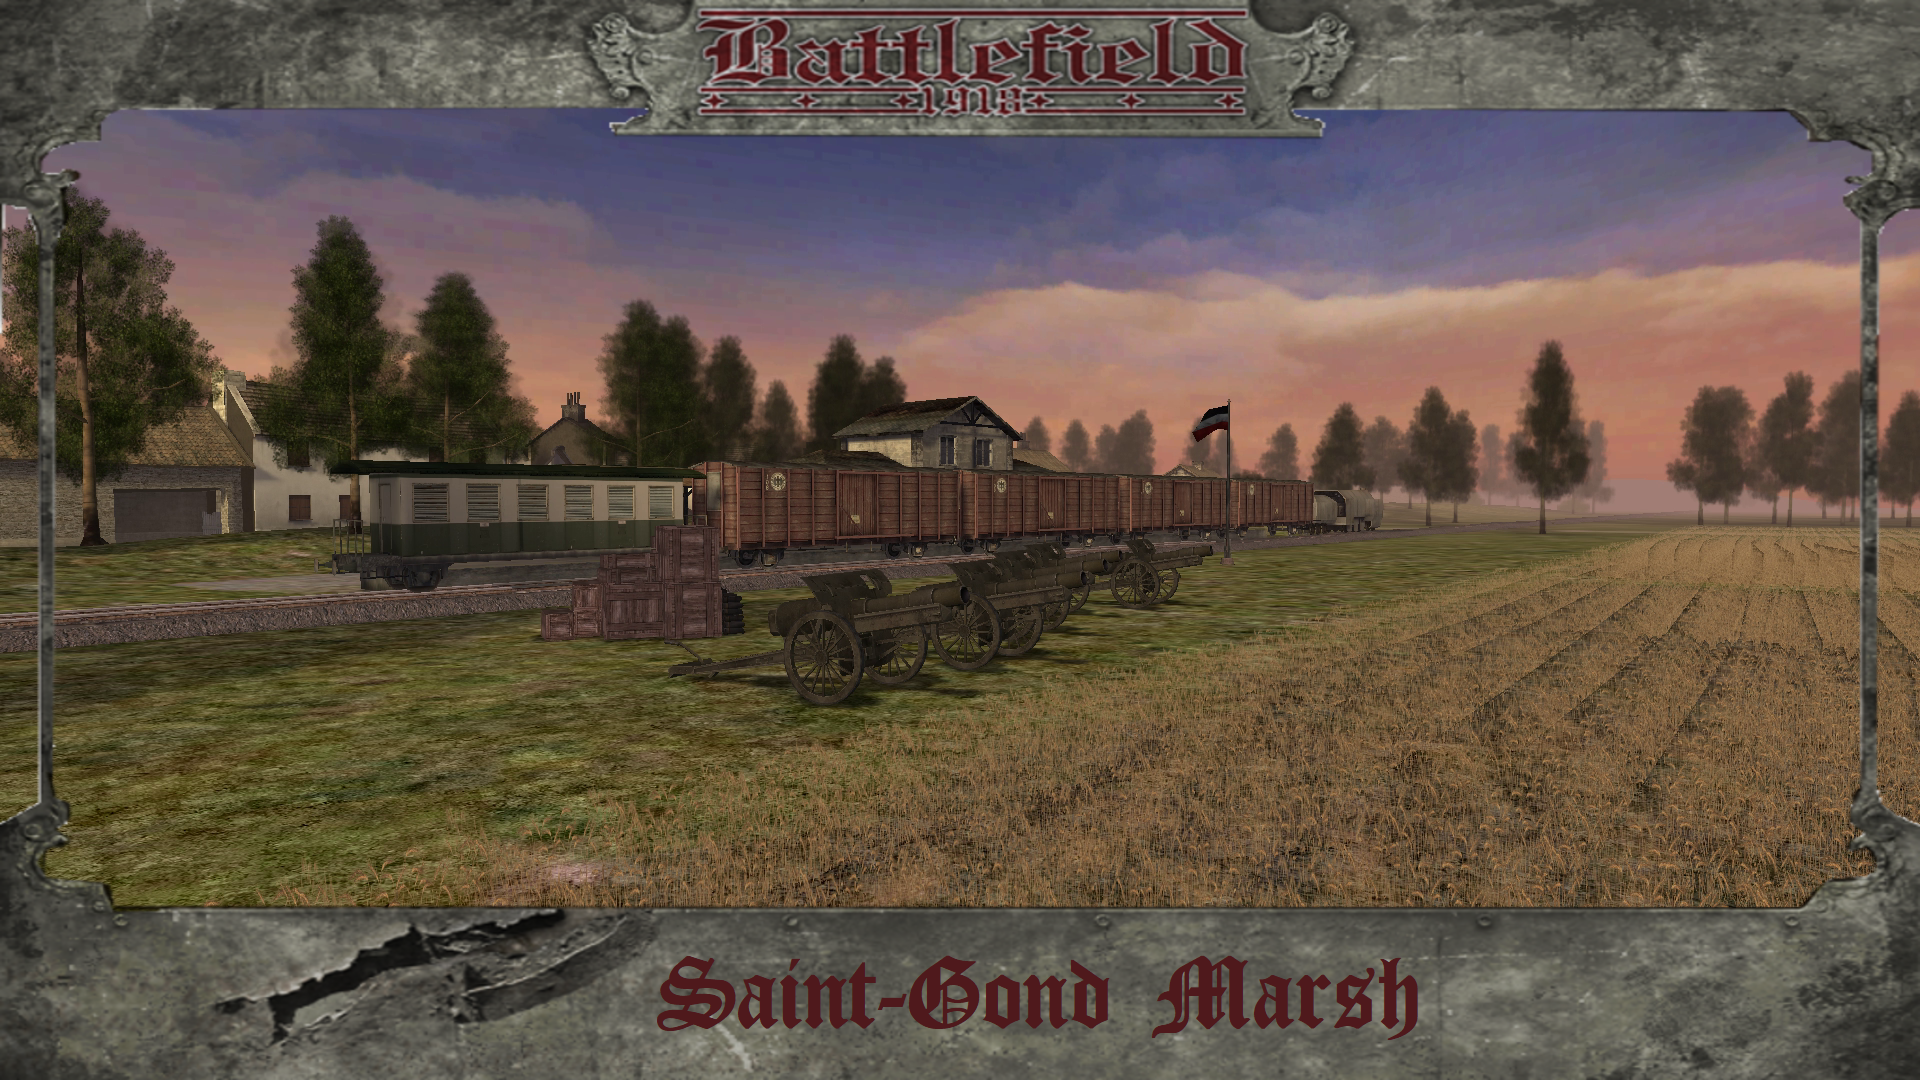 saint gond 03